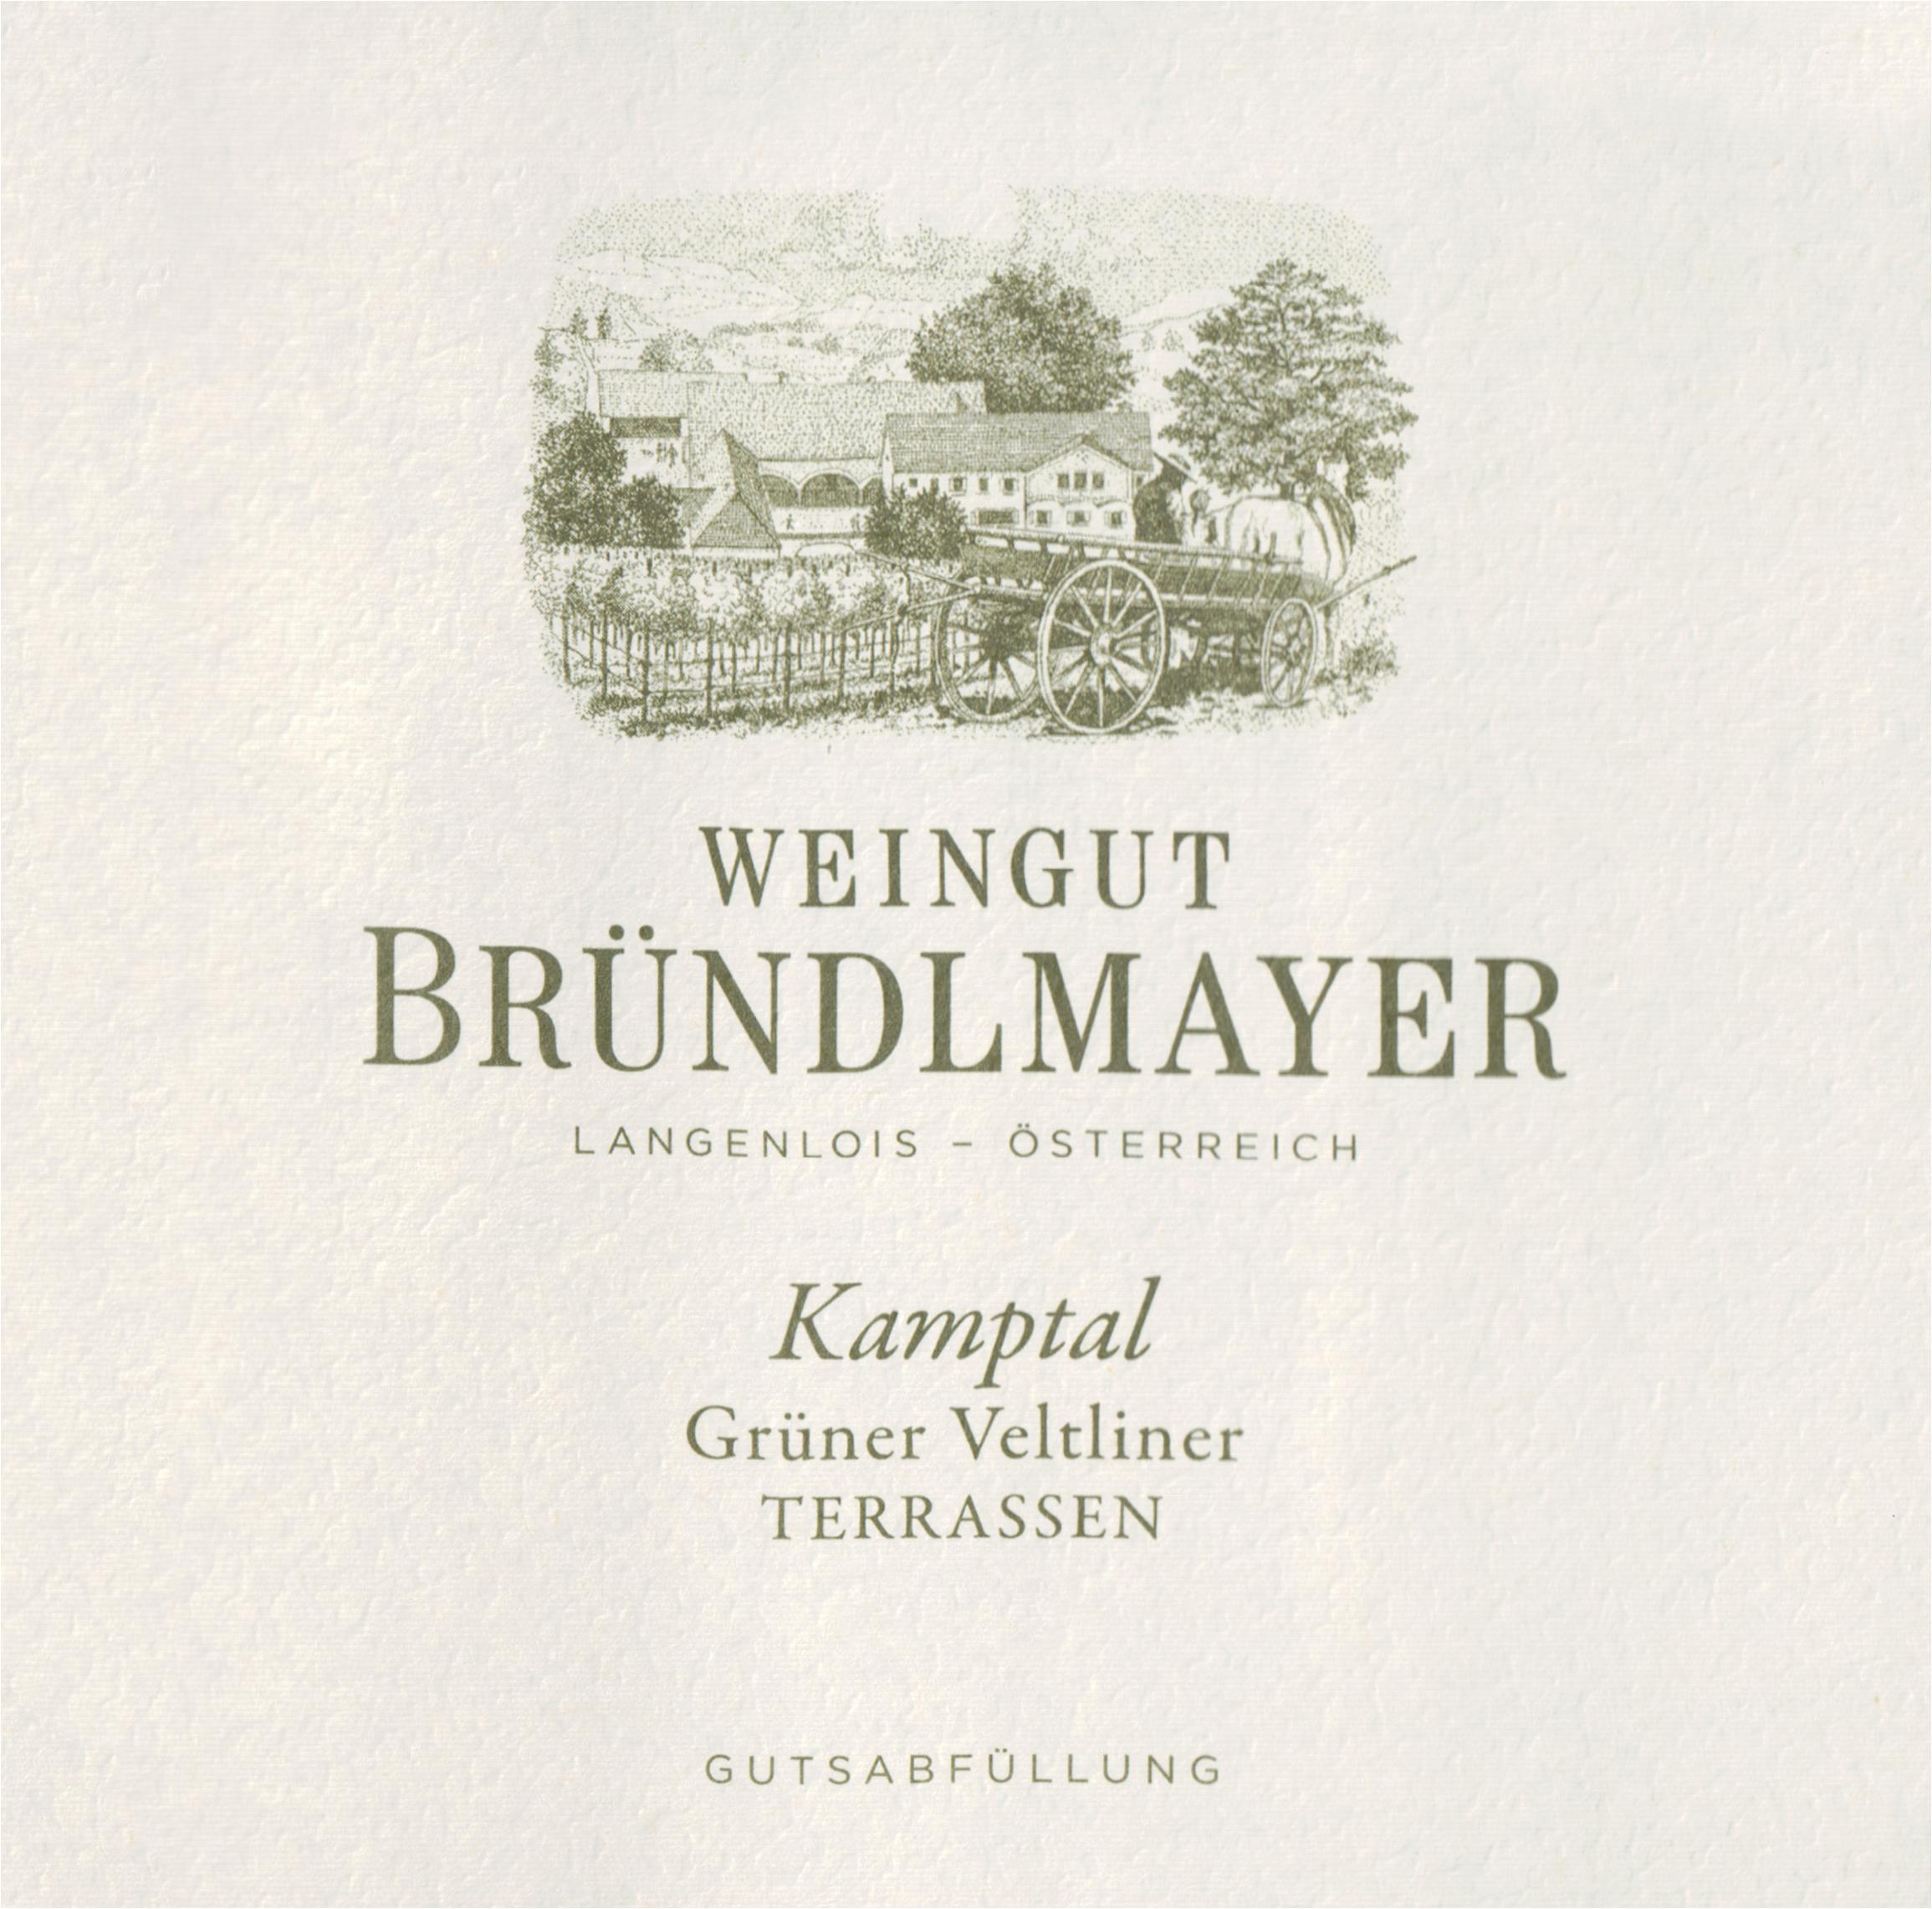 Brundlmayer Gruner Veltliner Kamptaler Terrassen 2019